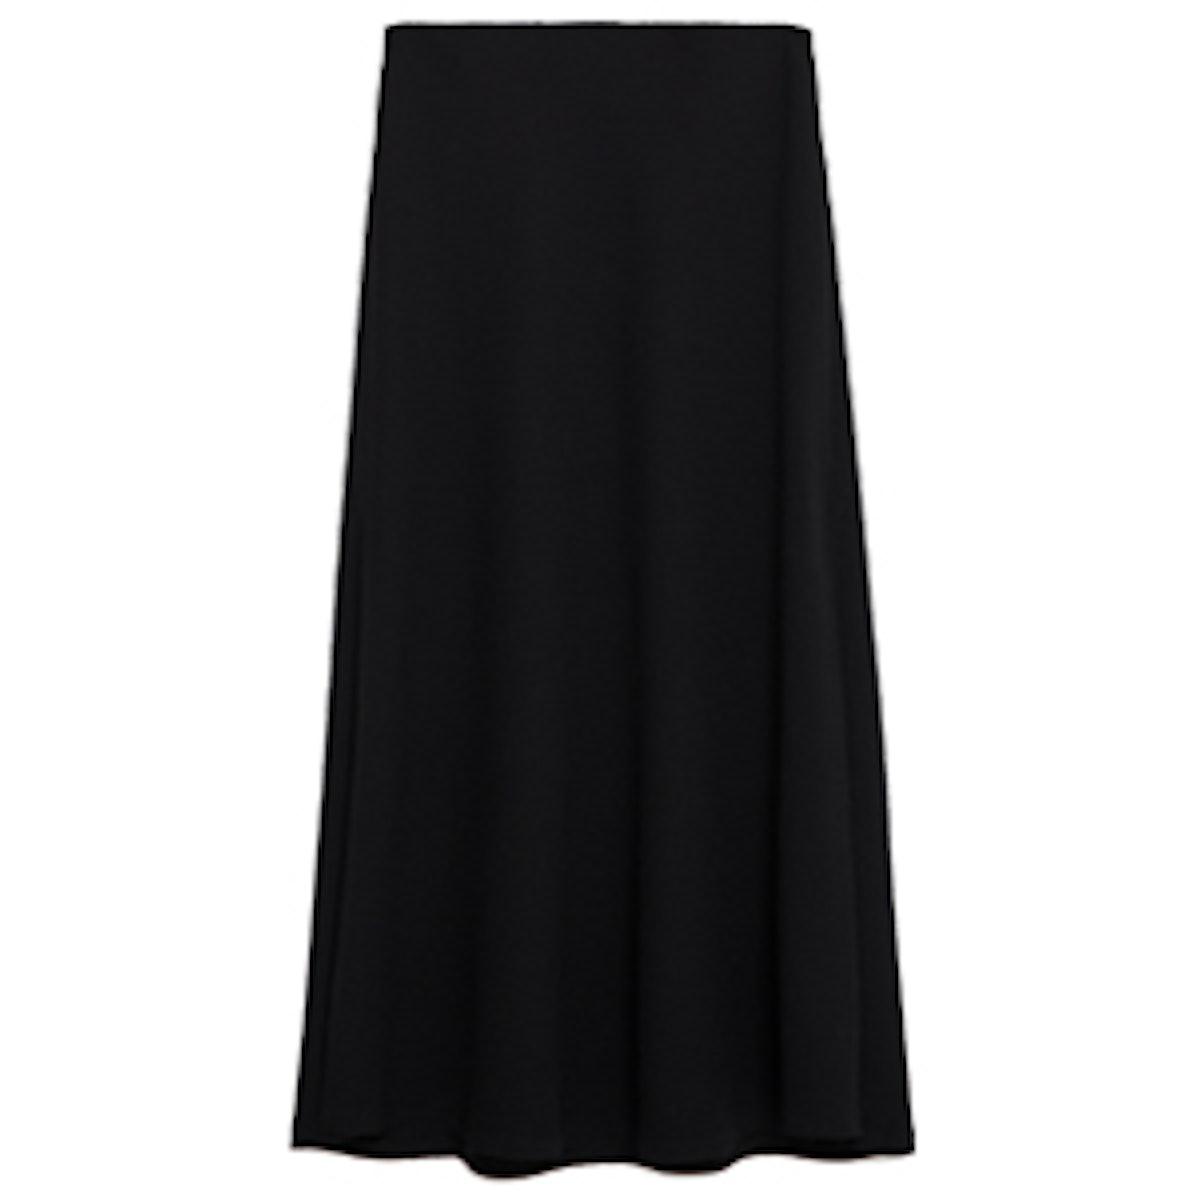 Long Skirt With Slits